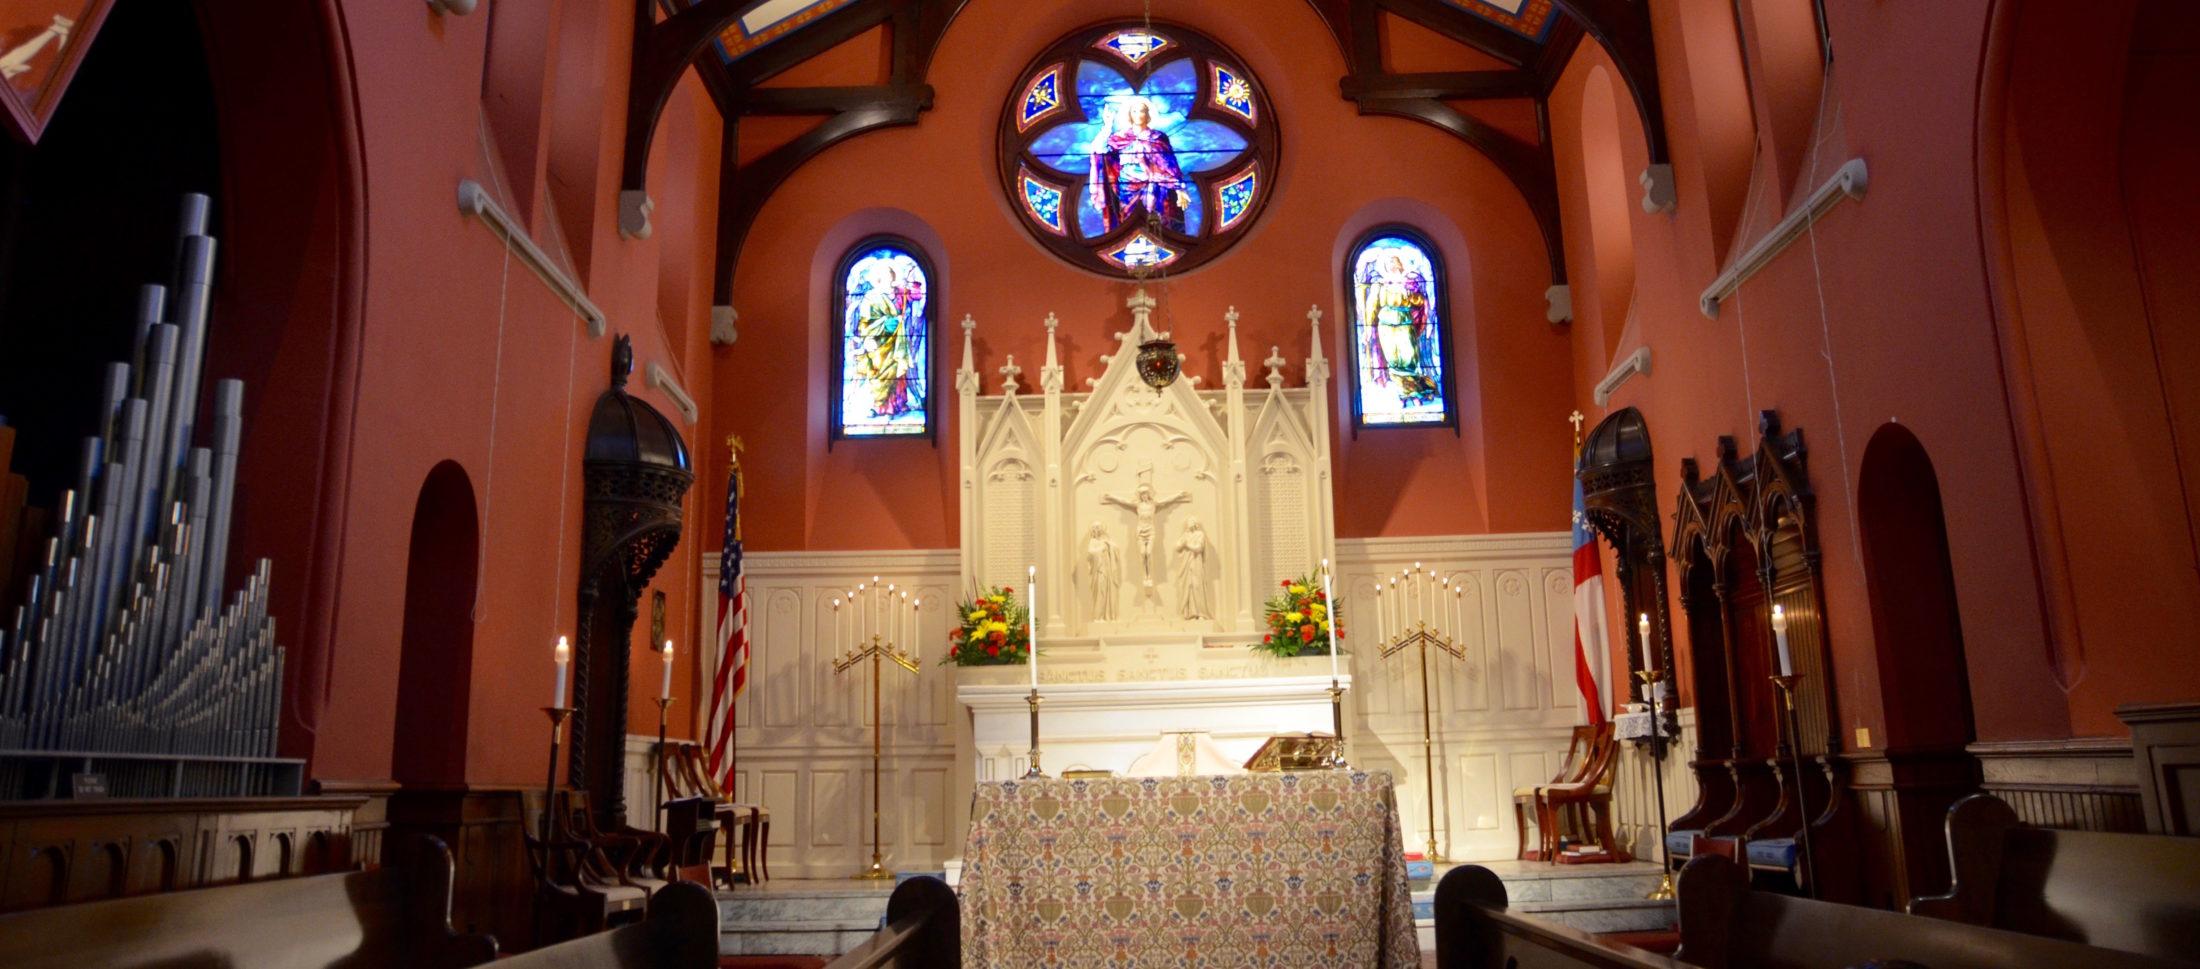 St. John's main altar - for visitors